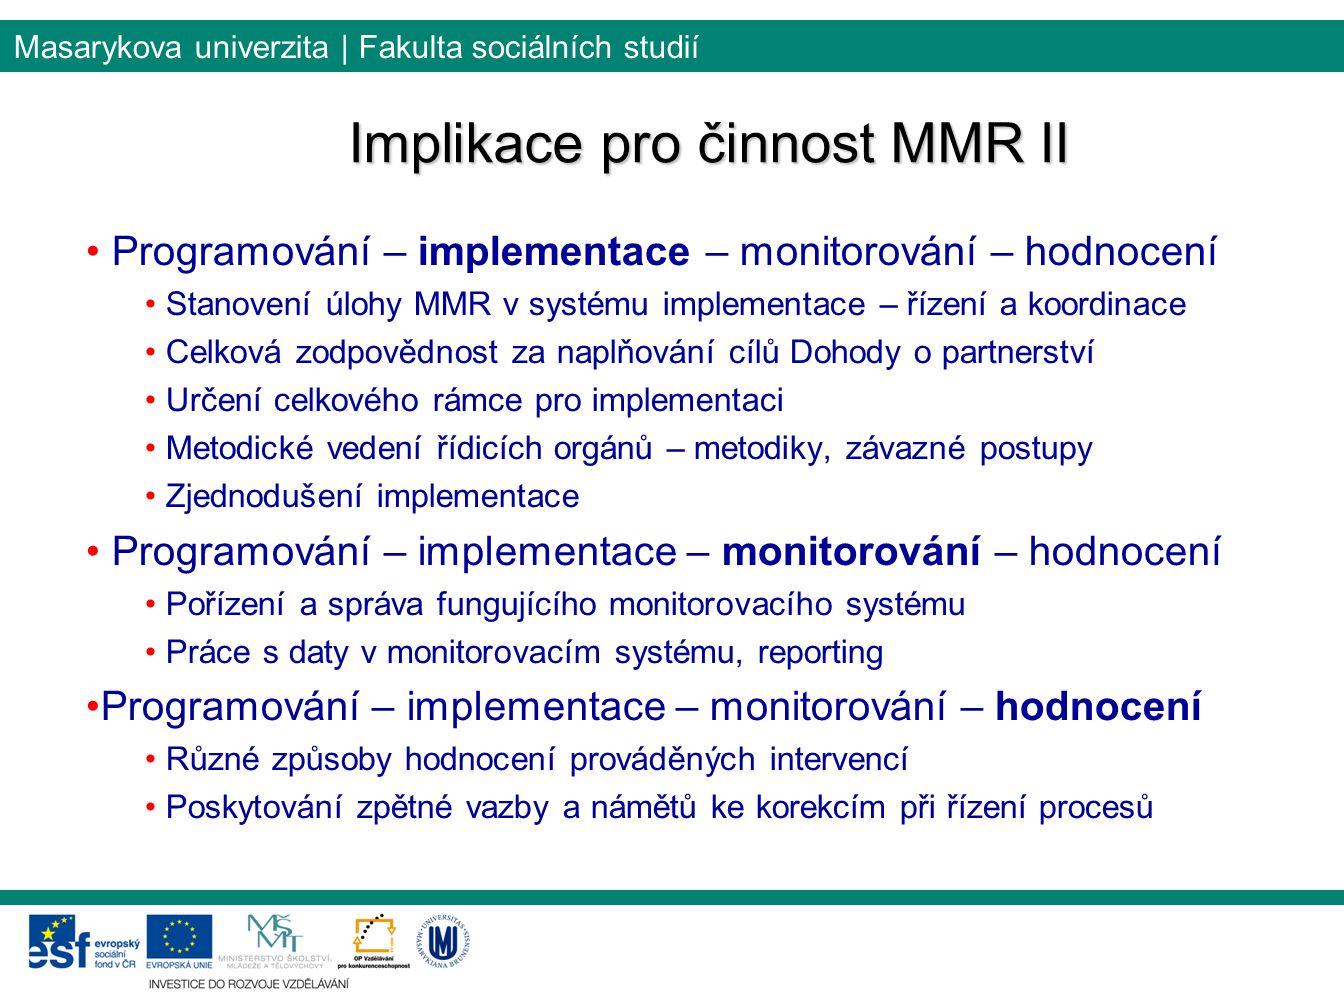 Implikace pro činnost MMR II